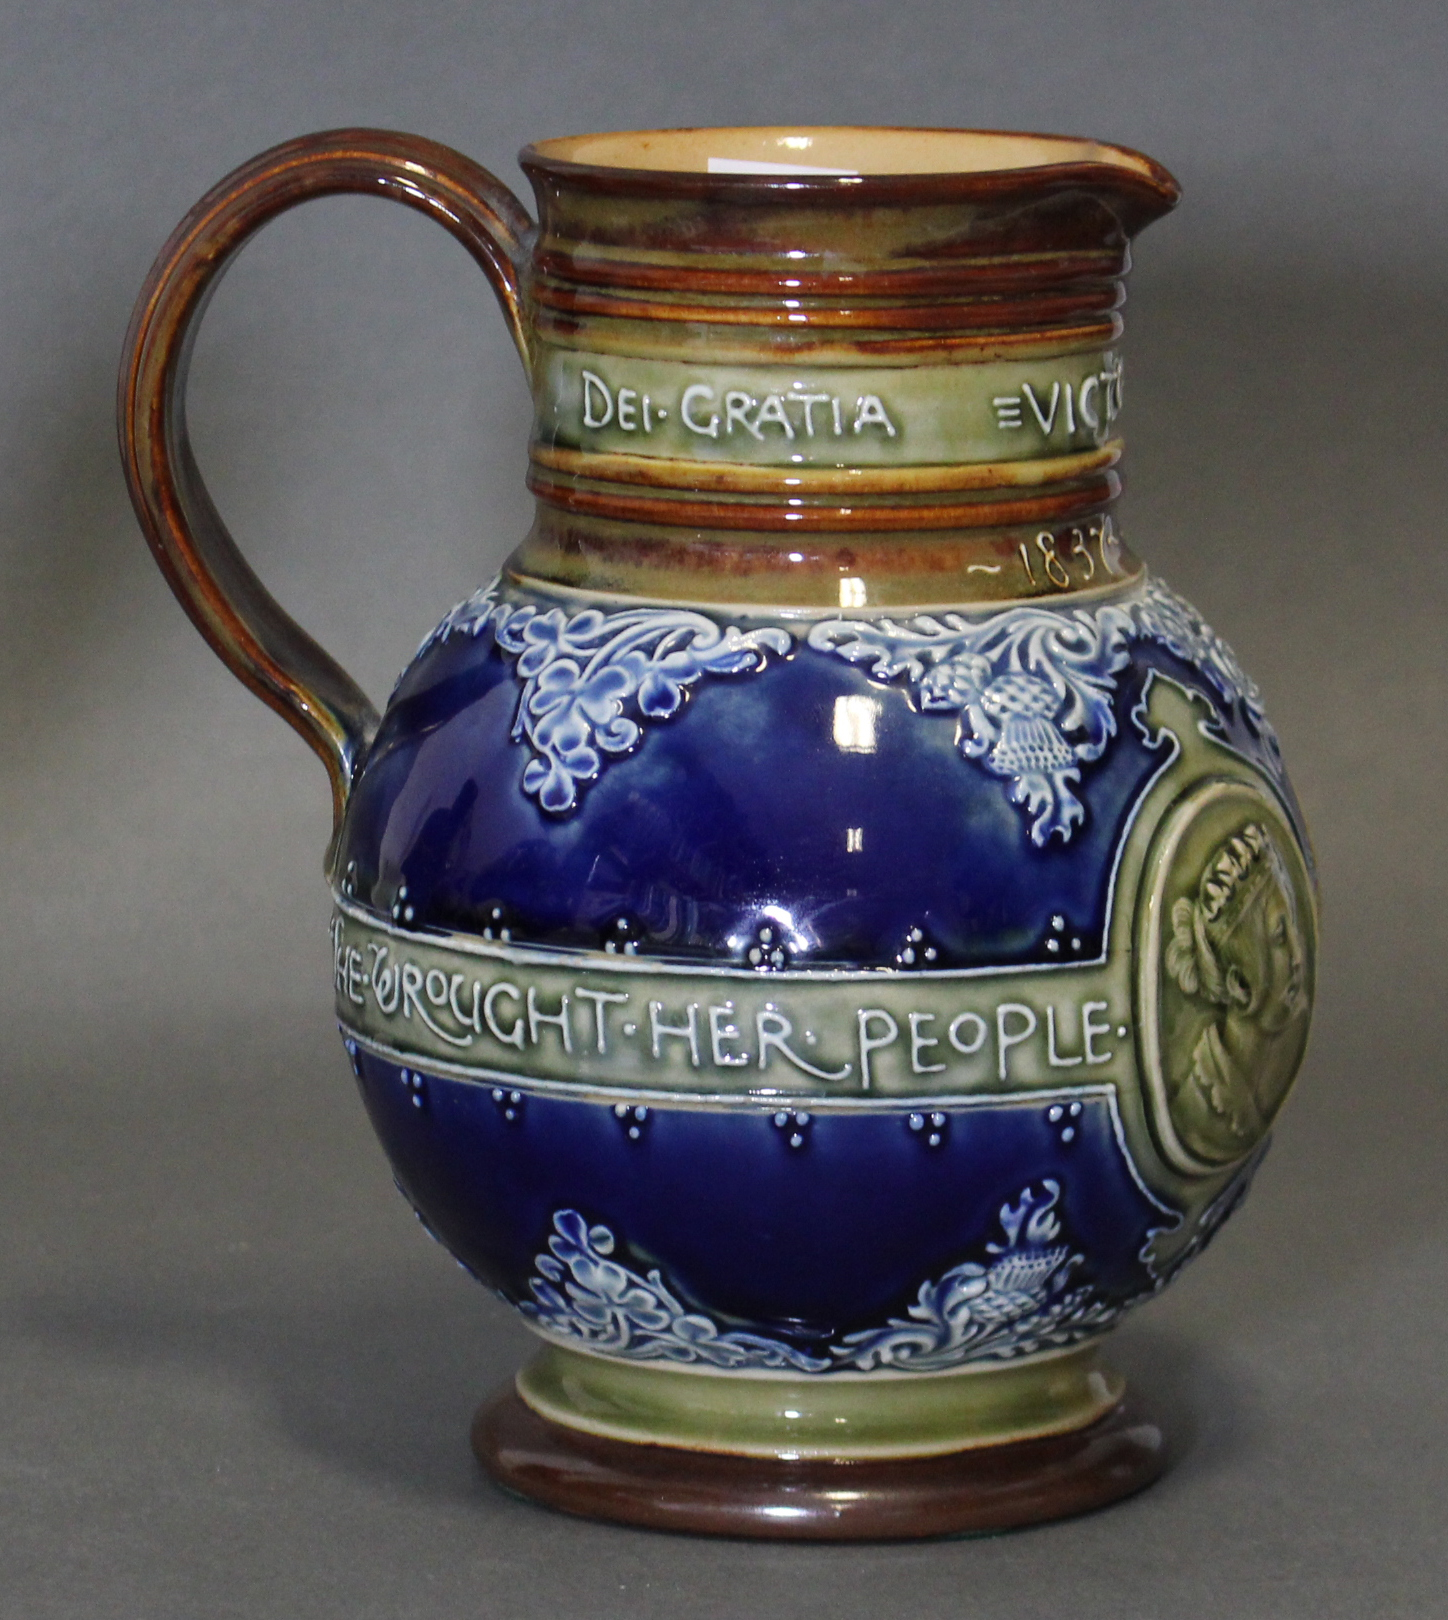 Lot 219 - A late 19th century Doulton Lambeth stoneware jug commemorating the Diamond Jubilee of Queen